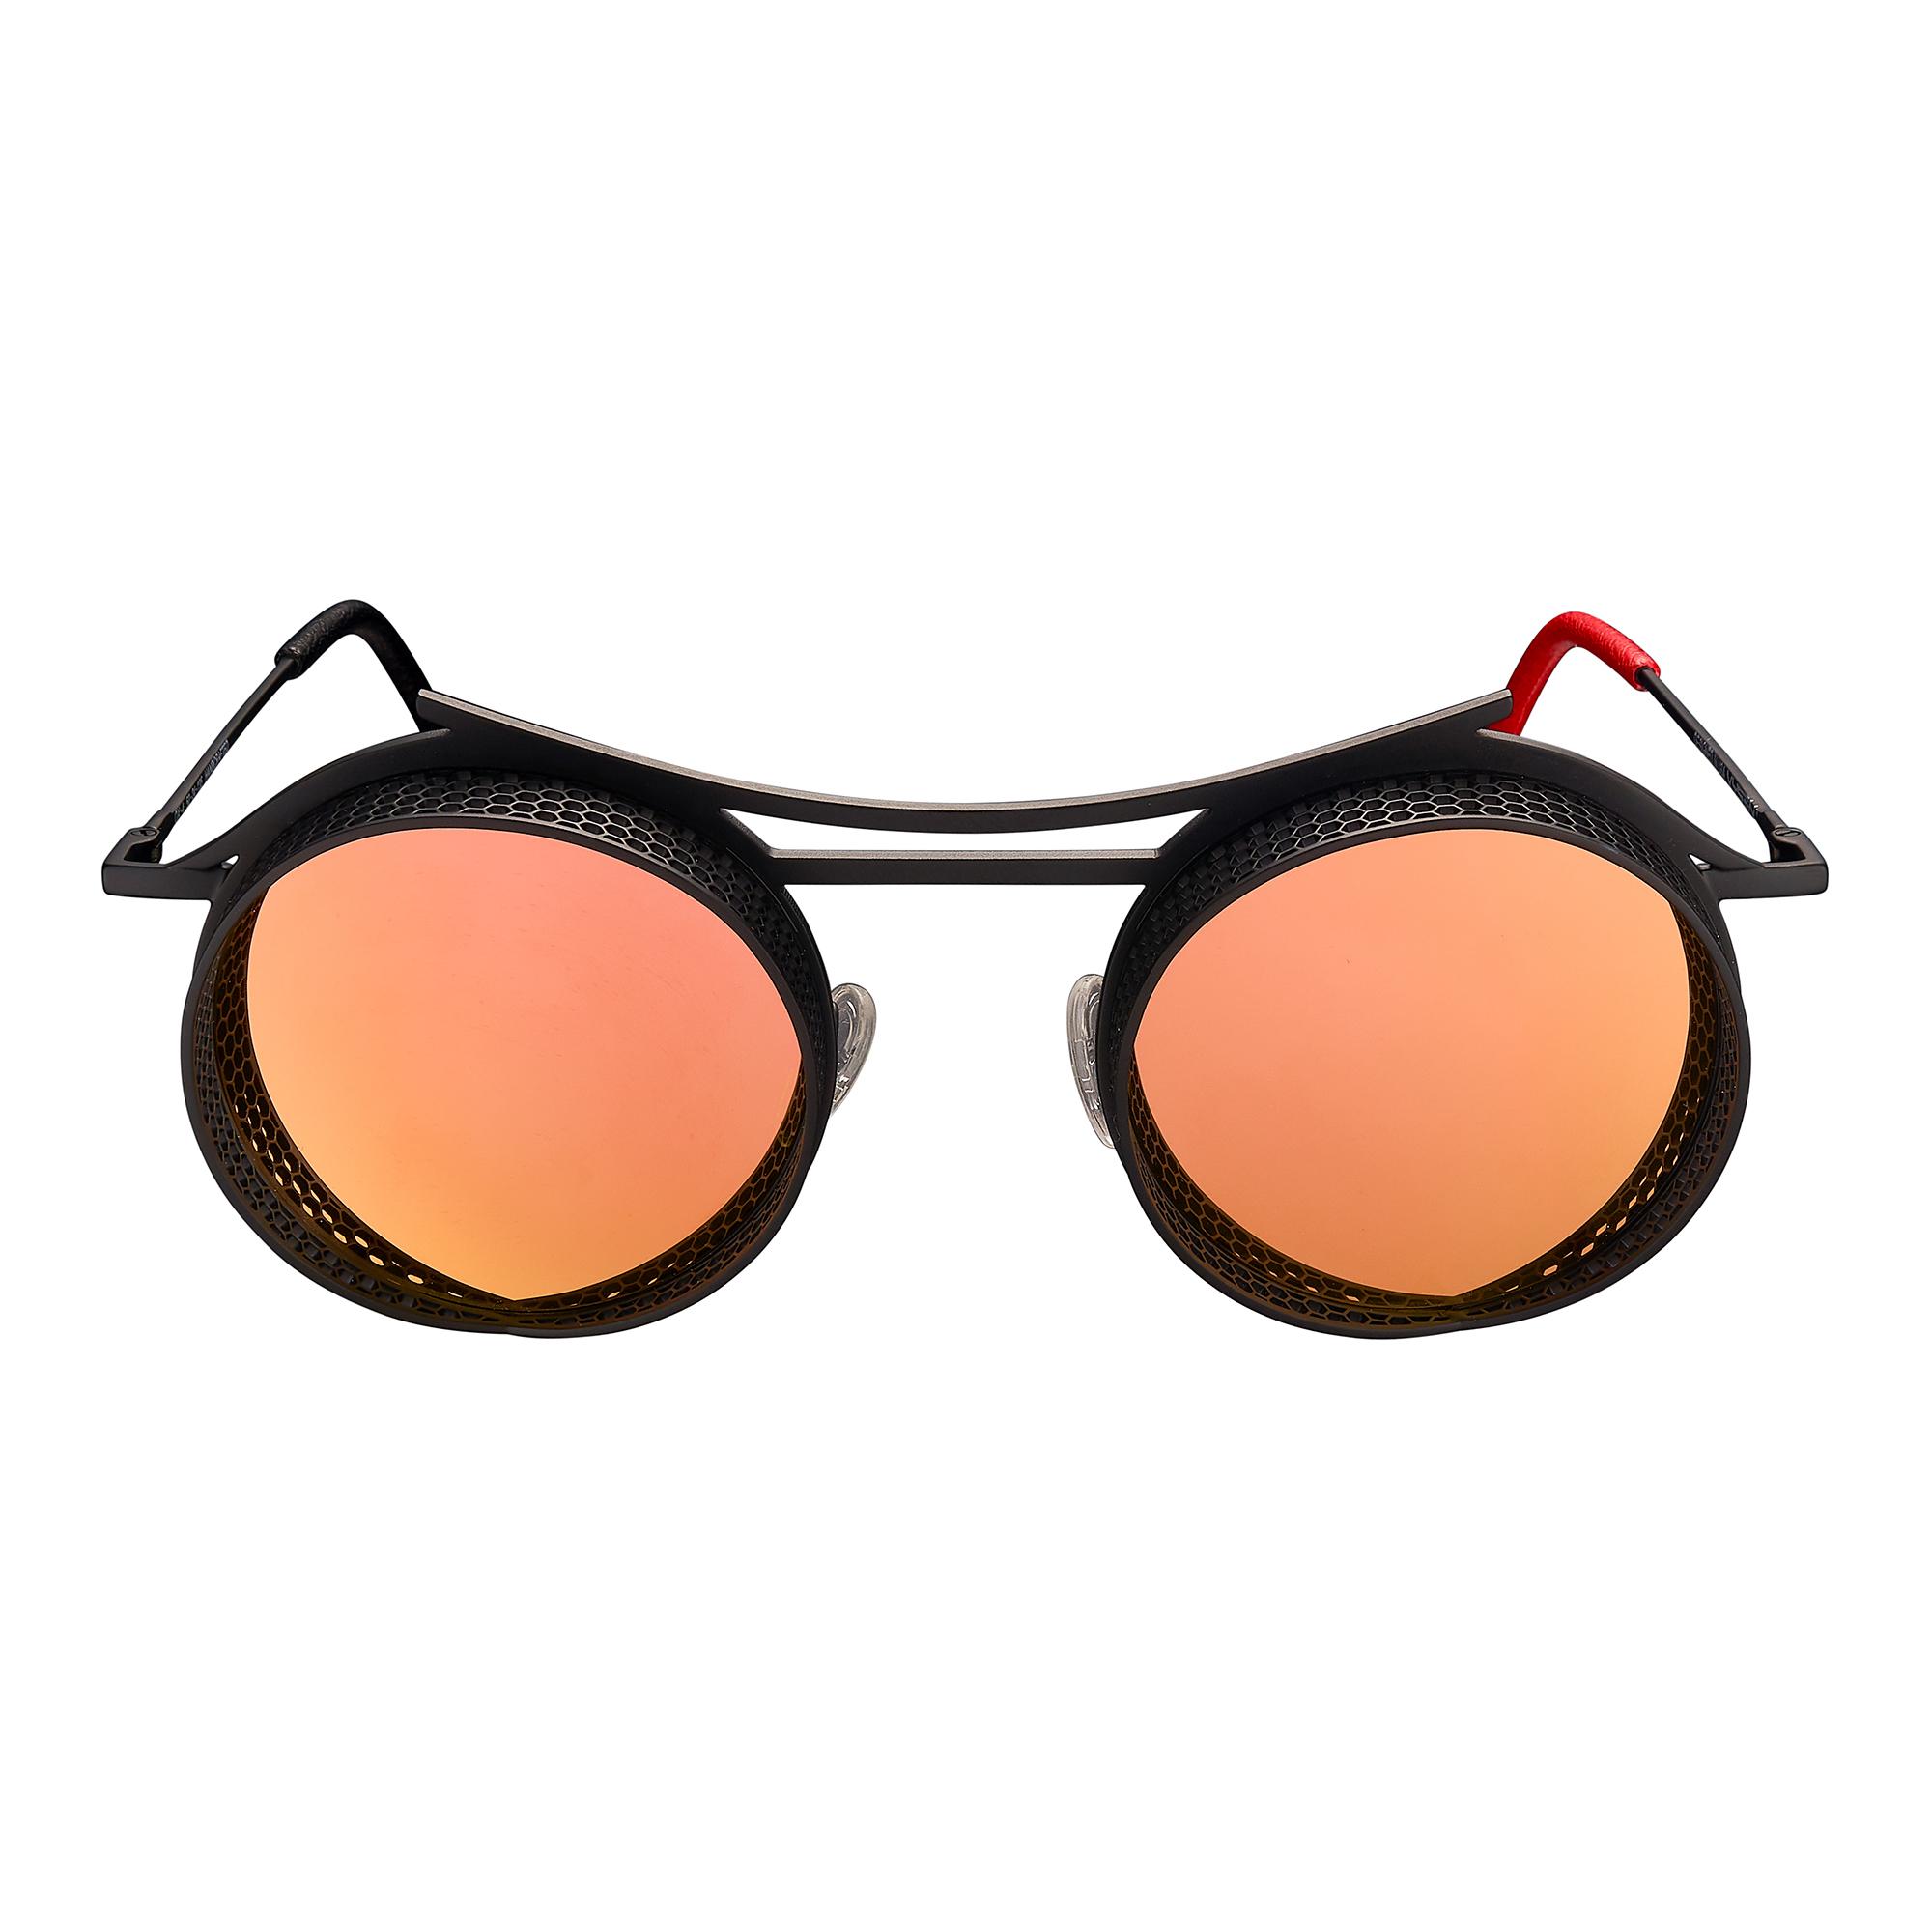 ONIX - OX - 4 - Black Matte Frame + Rose Gold Mirror Lenses